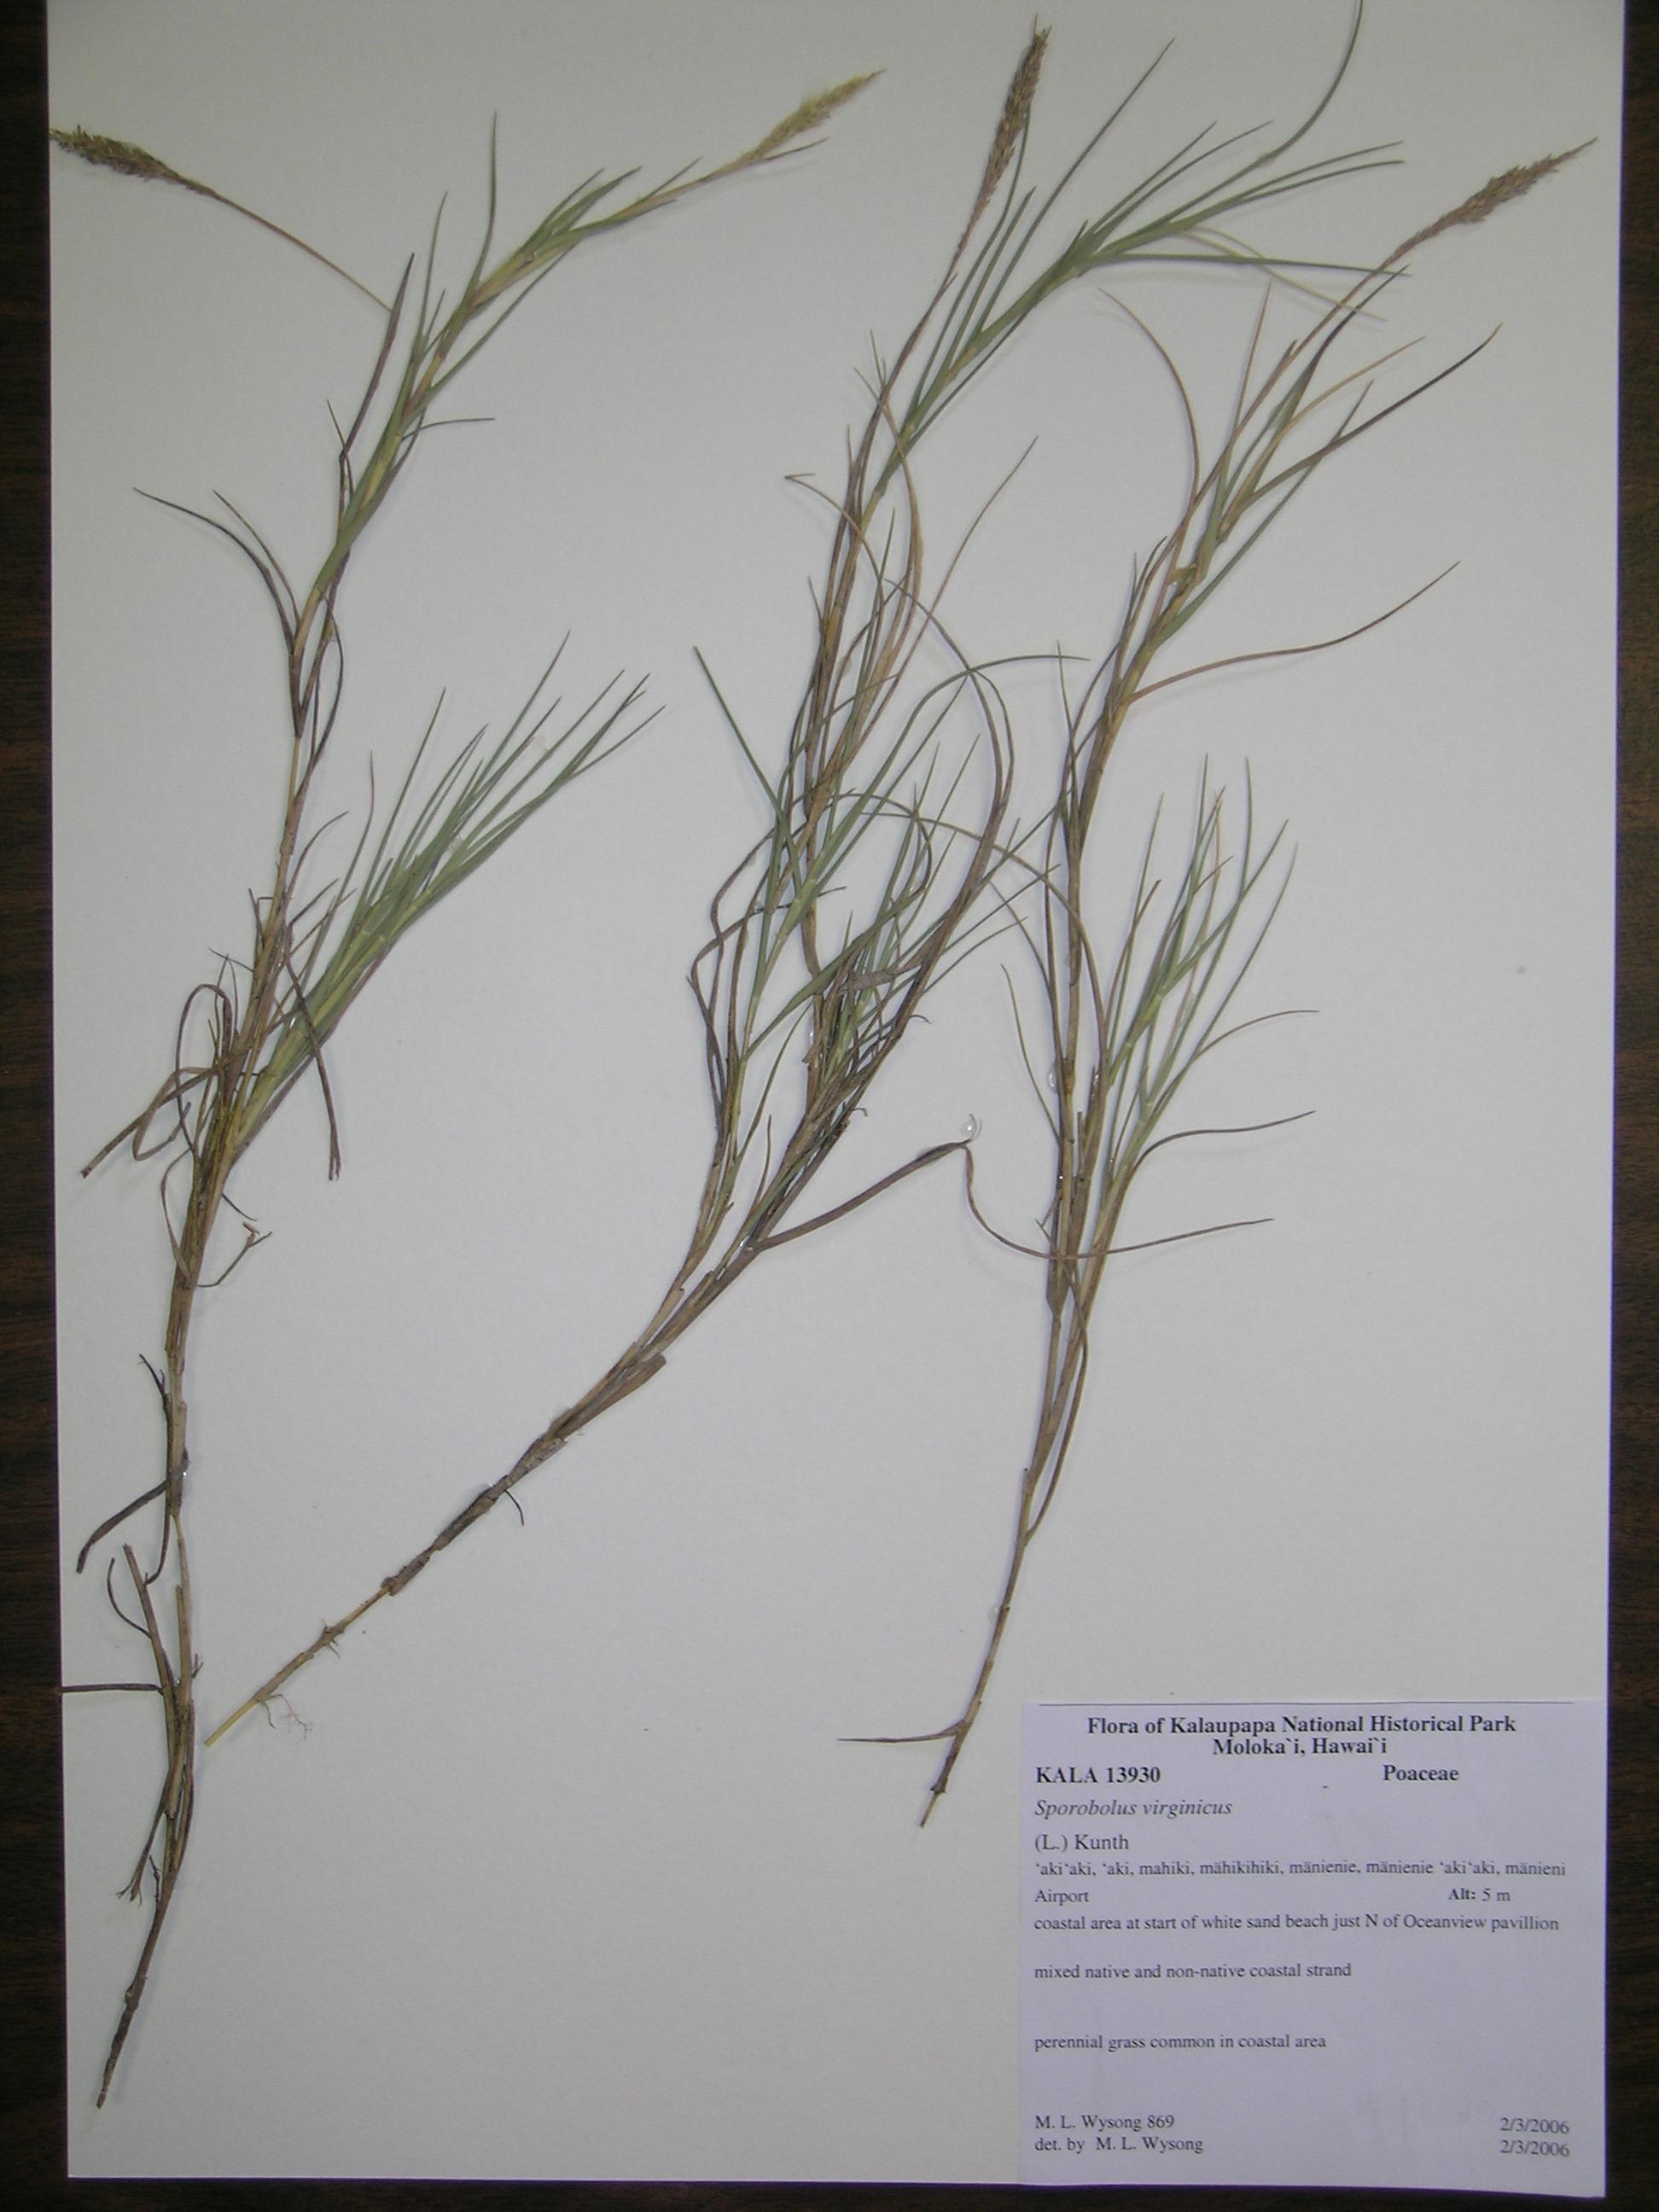 sporobolus virginicus voucher kala13930 sporobolus virginicus species    Sporobolus Virginicus